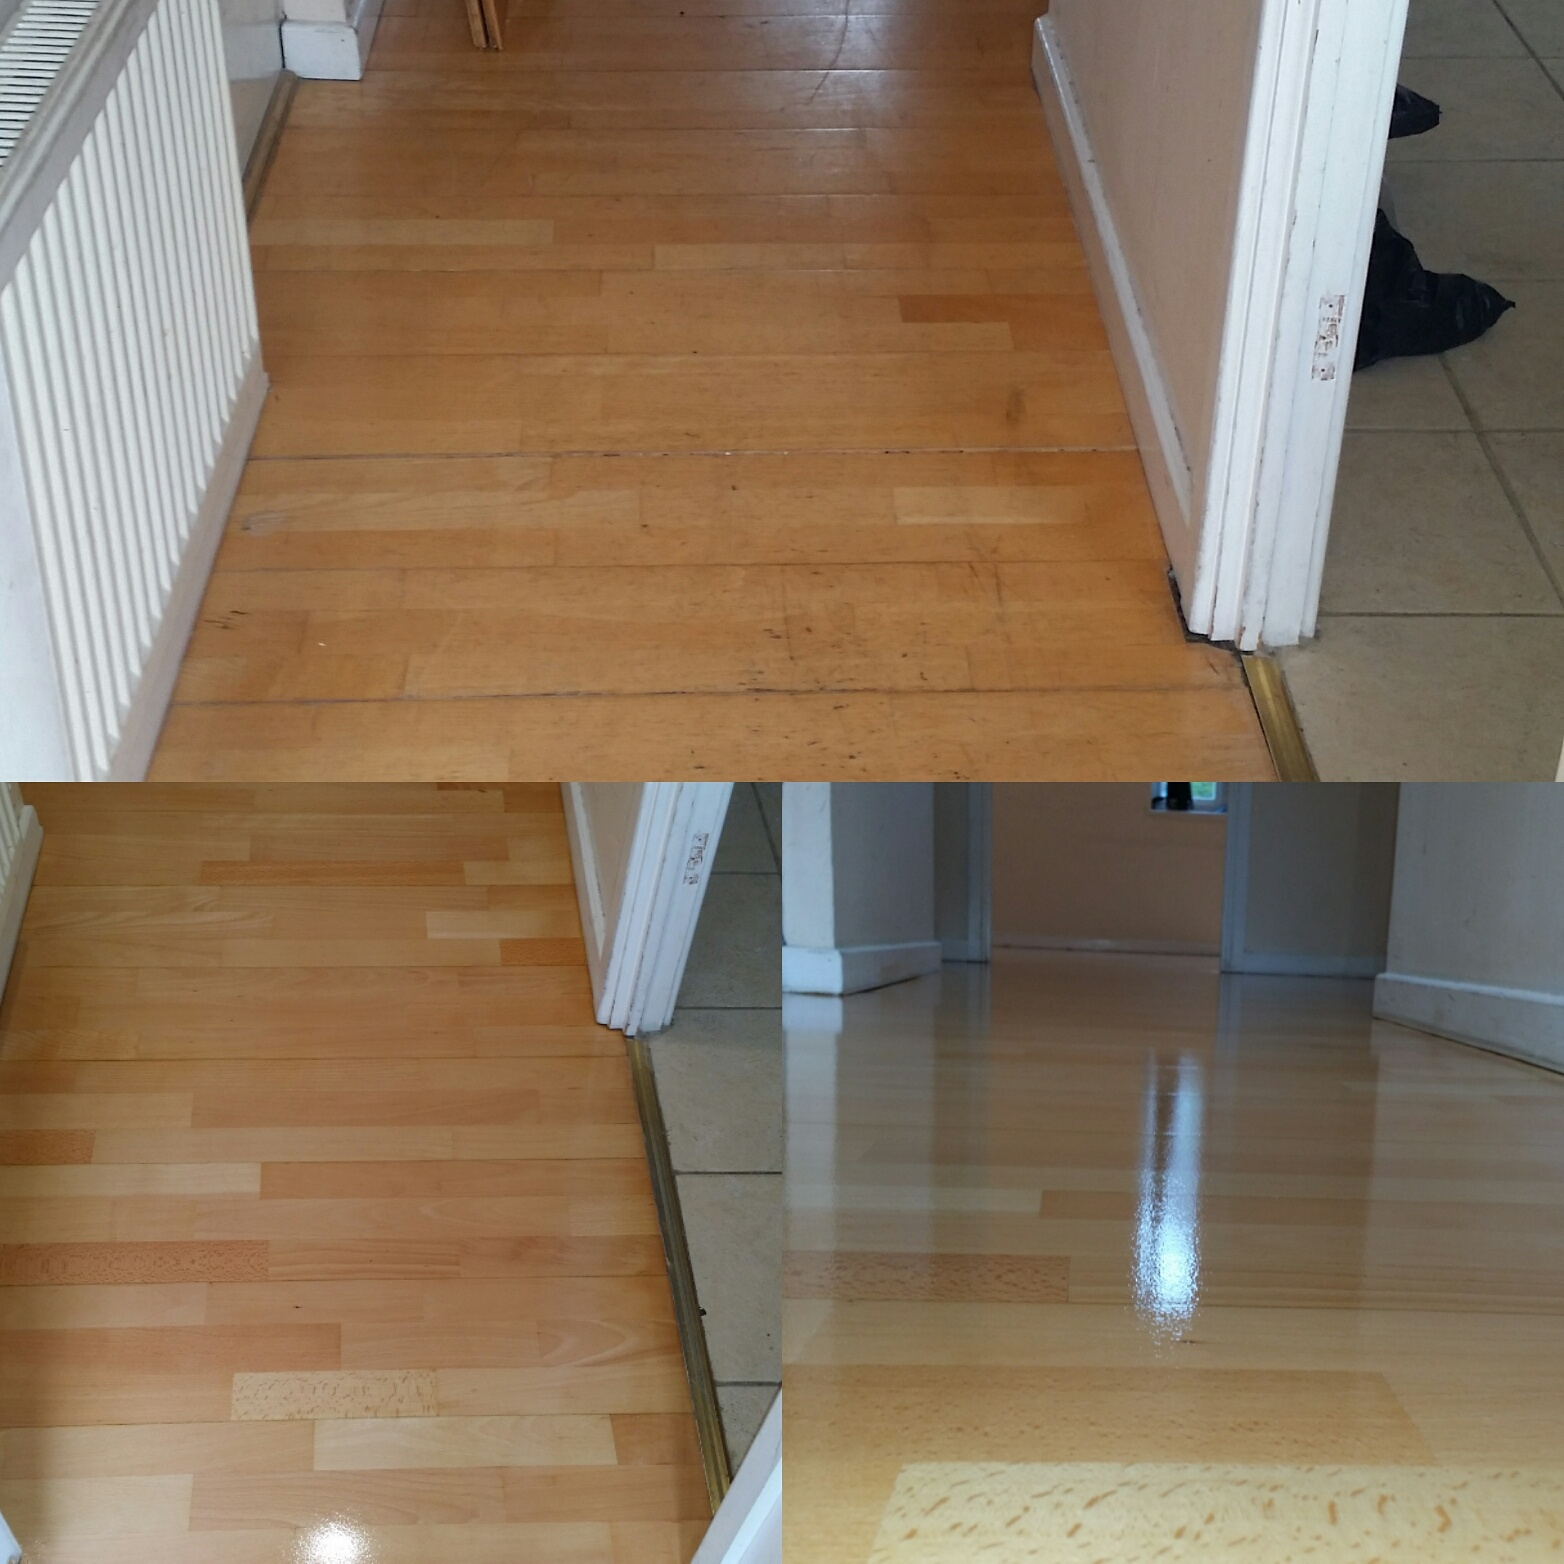 Essex Floor Sanding and Refinishing